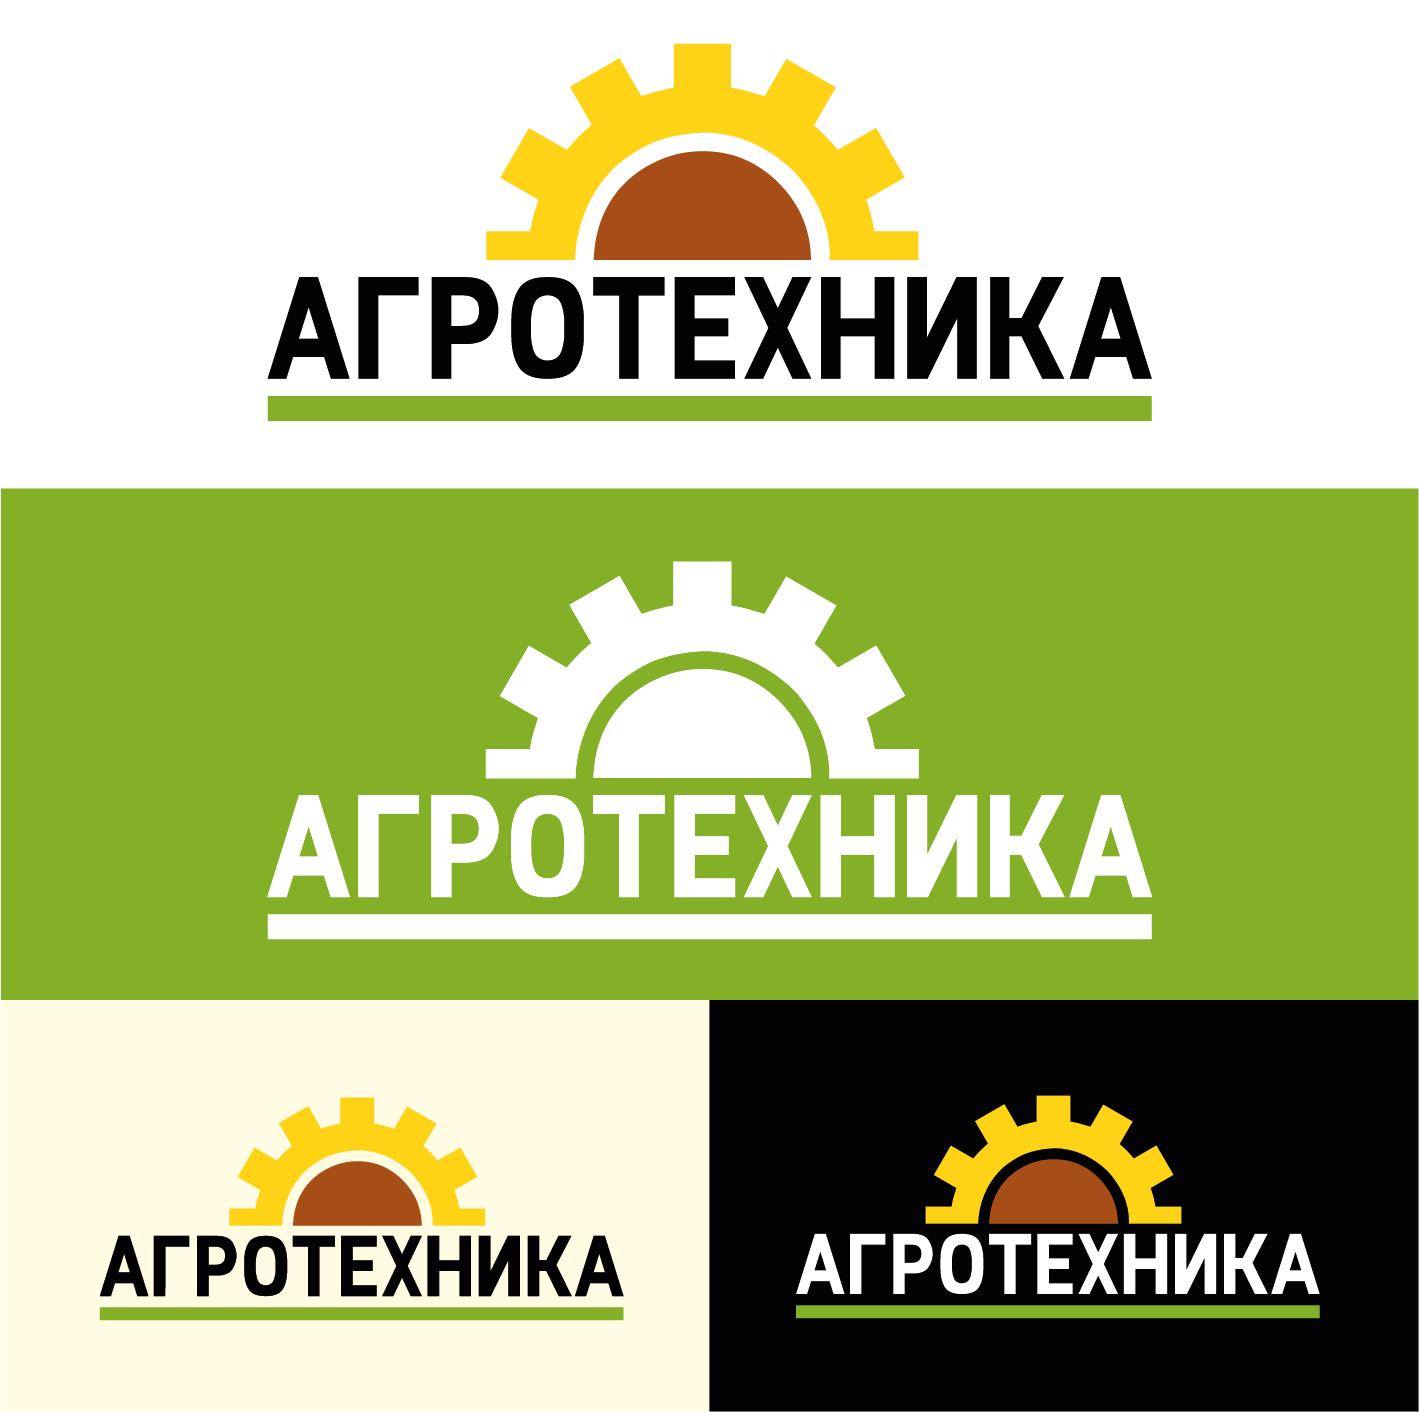 Разработка логотипа для компании Агротехника фото f_0315c07b4415ed44.jpg